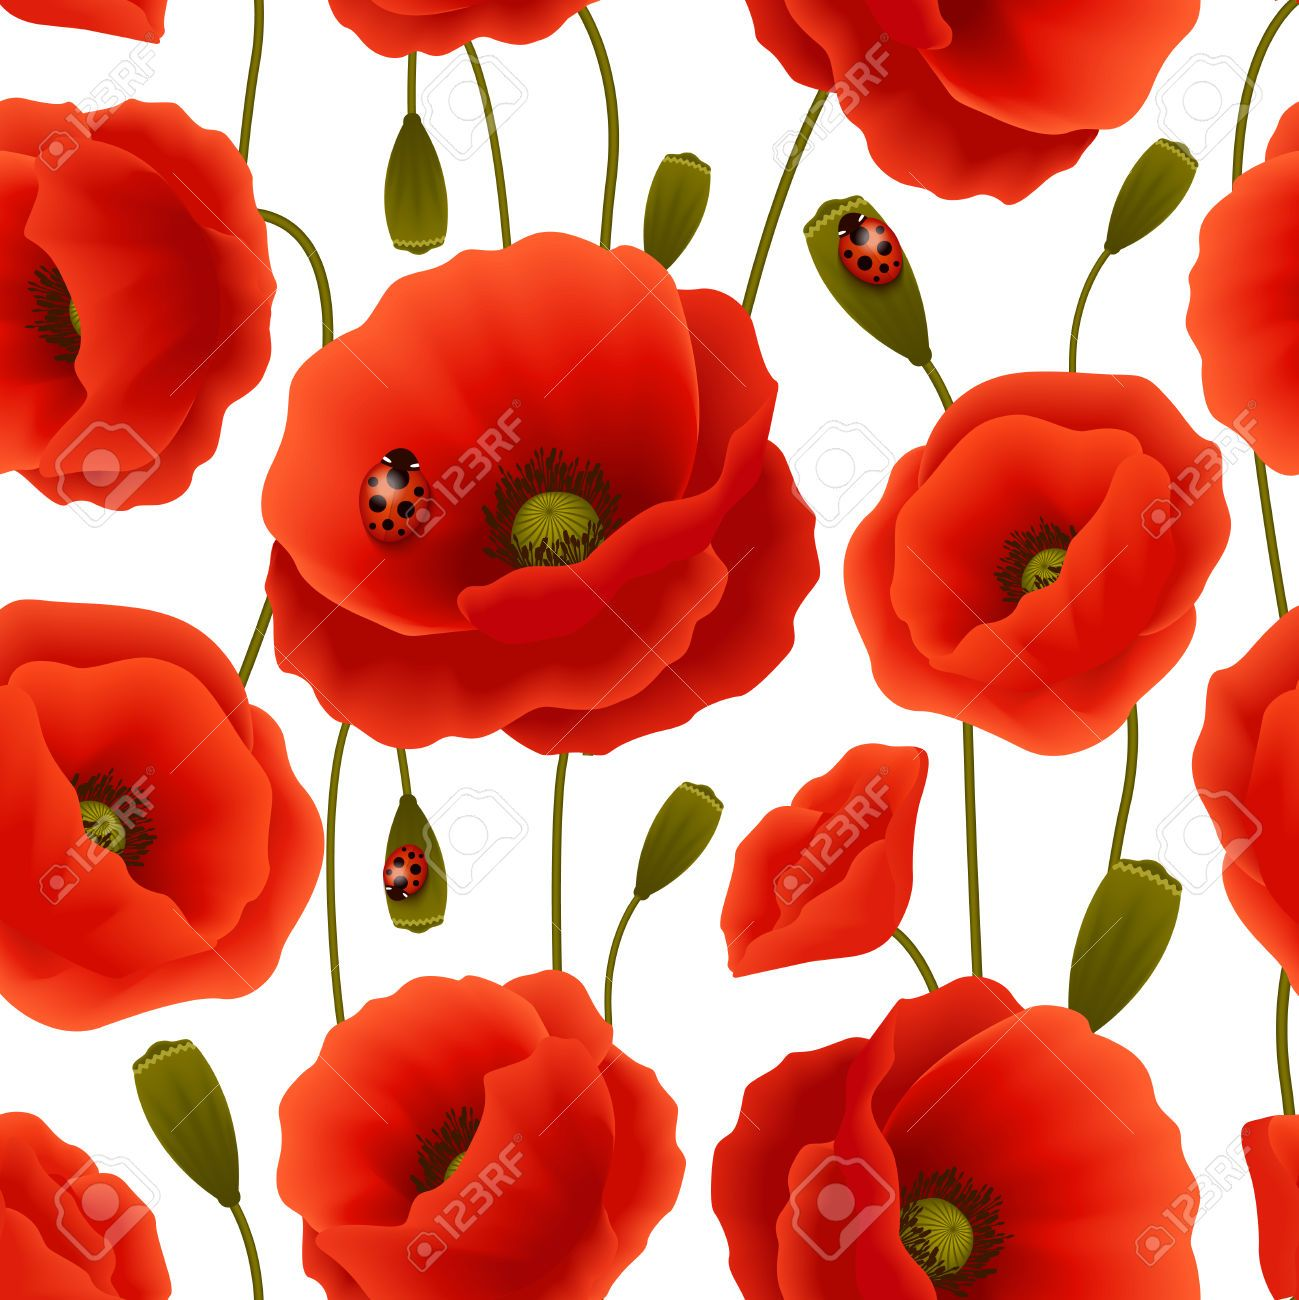 27827777 vibrant floral seamless pattern of poppy flowers and 932c6544750edcb24b575bb8fc96c9dbg mightylinksfo